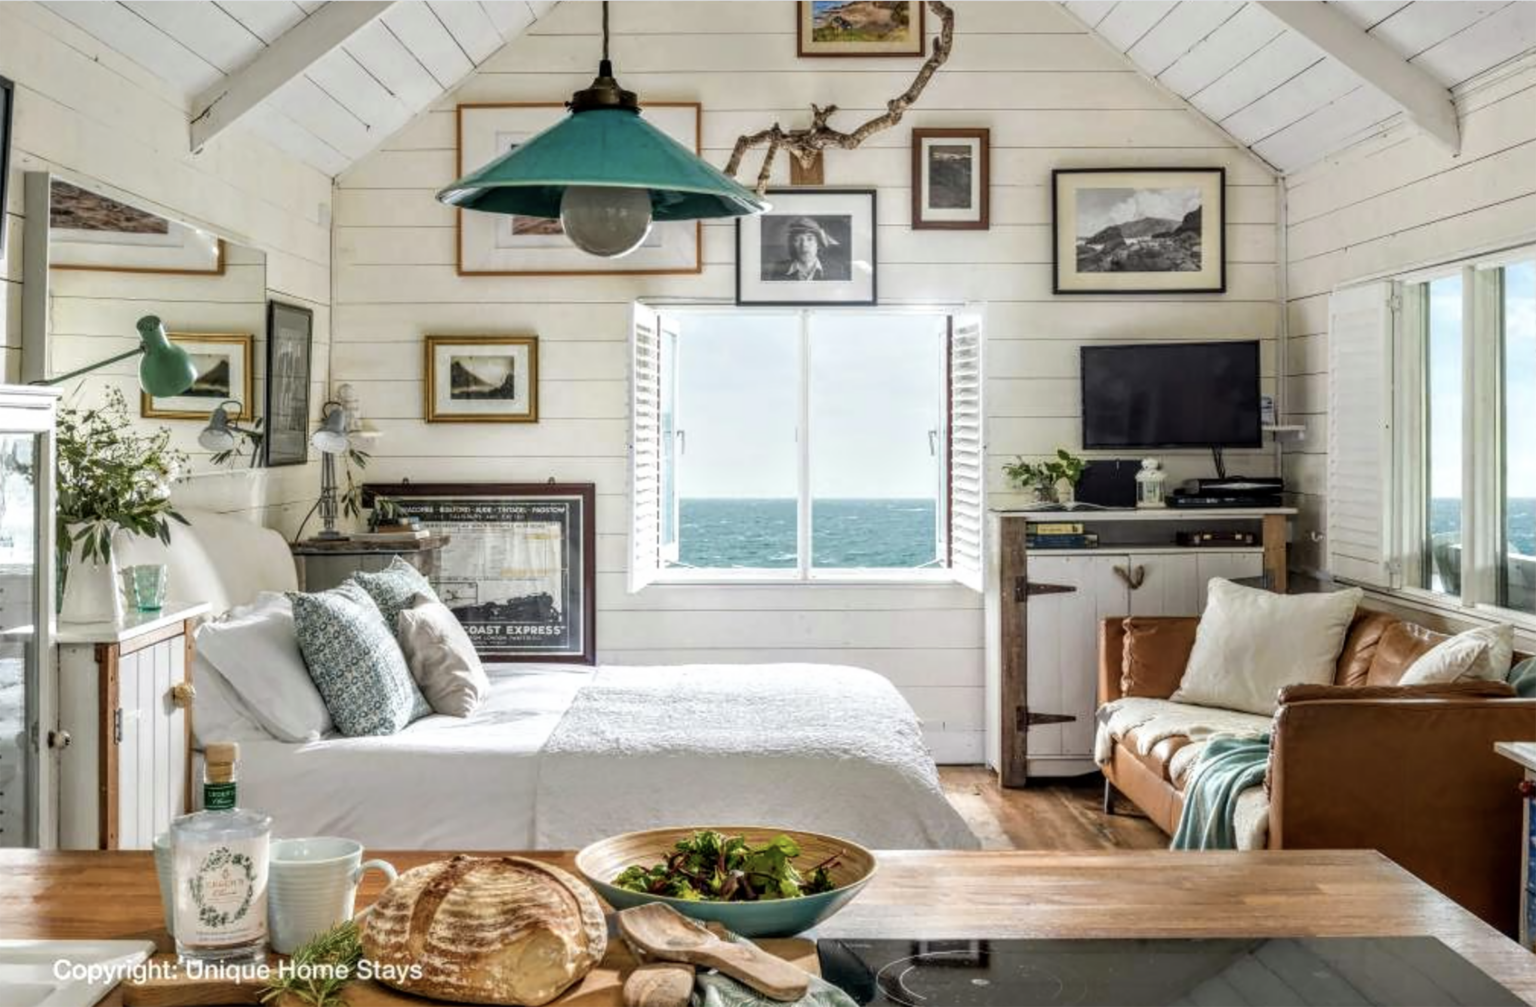 Cornwall beach hut featured on Cote de Texas